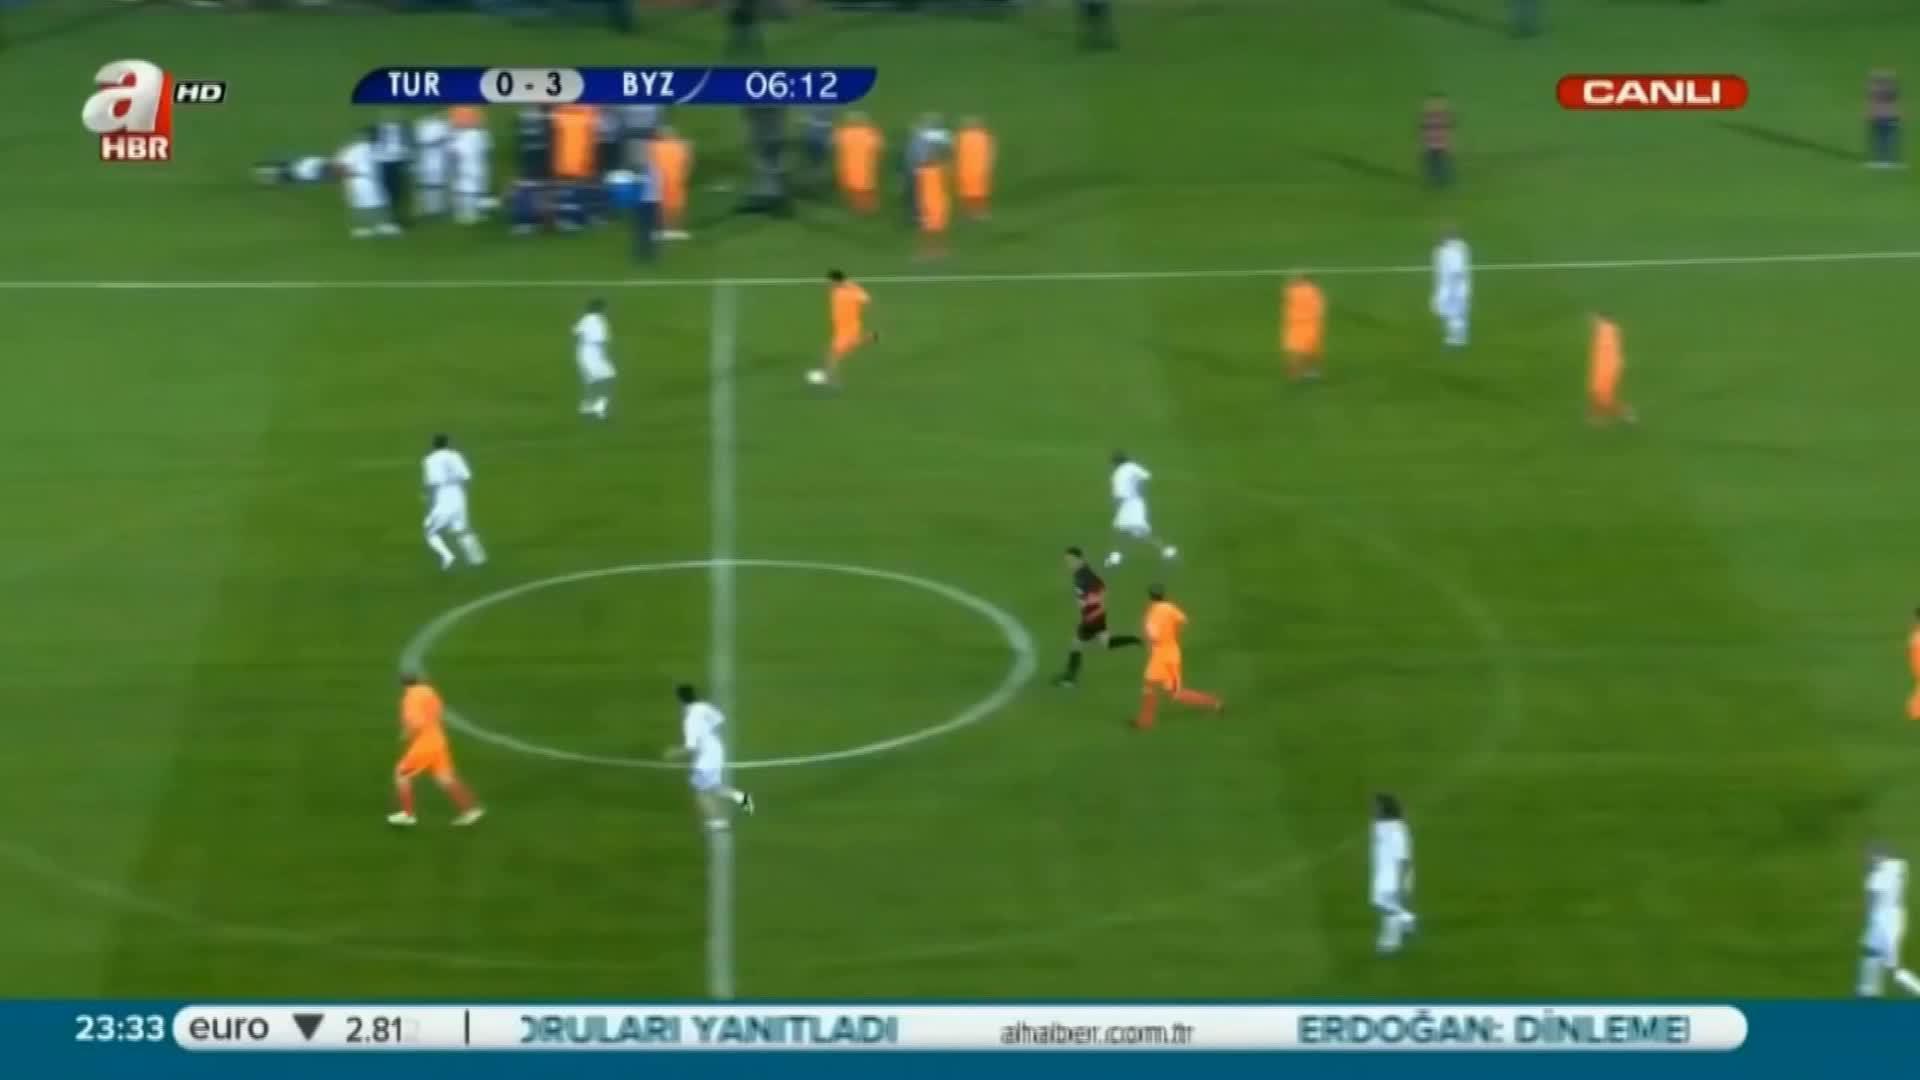 soccergifs, superathletegifs, Head Trick From The Best Soccer Player Of All Times: Recep Tayyip Erdoğan GIFs